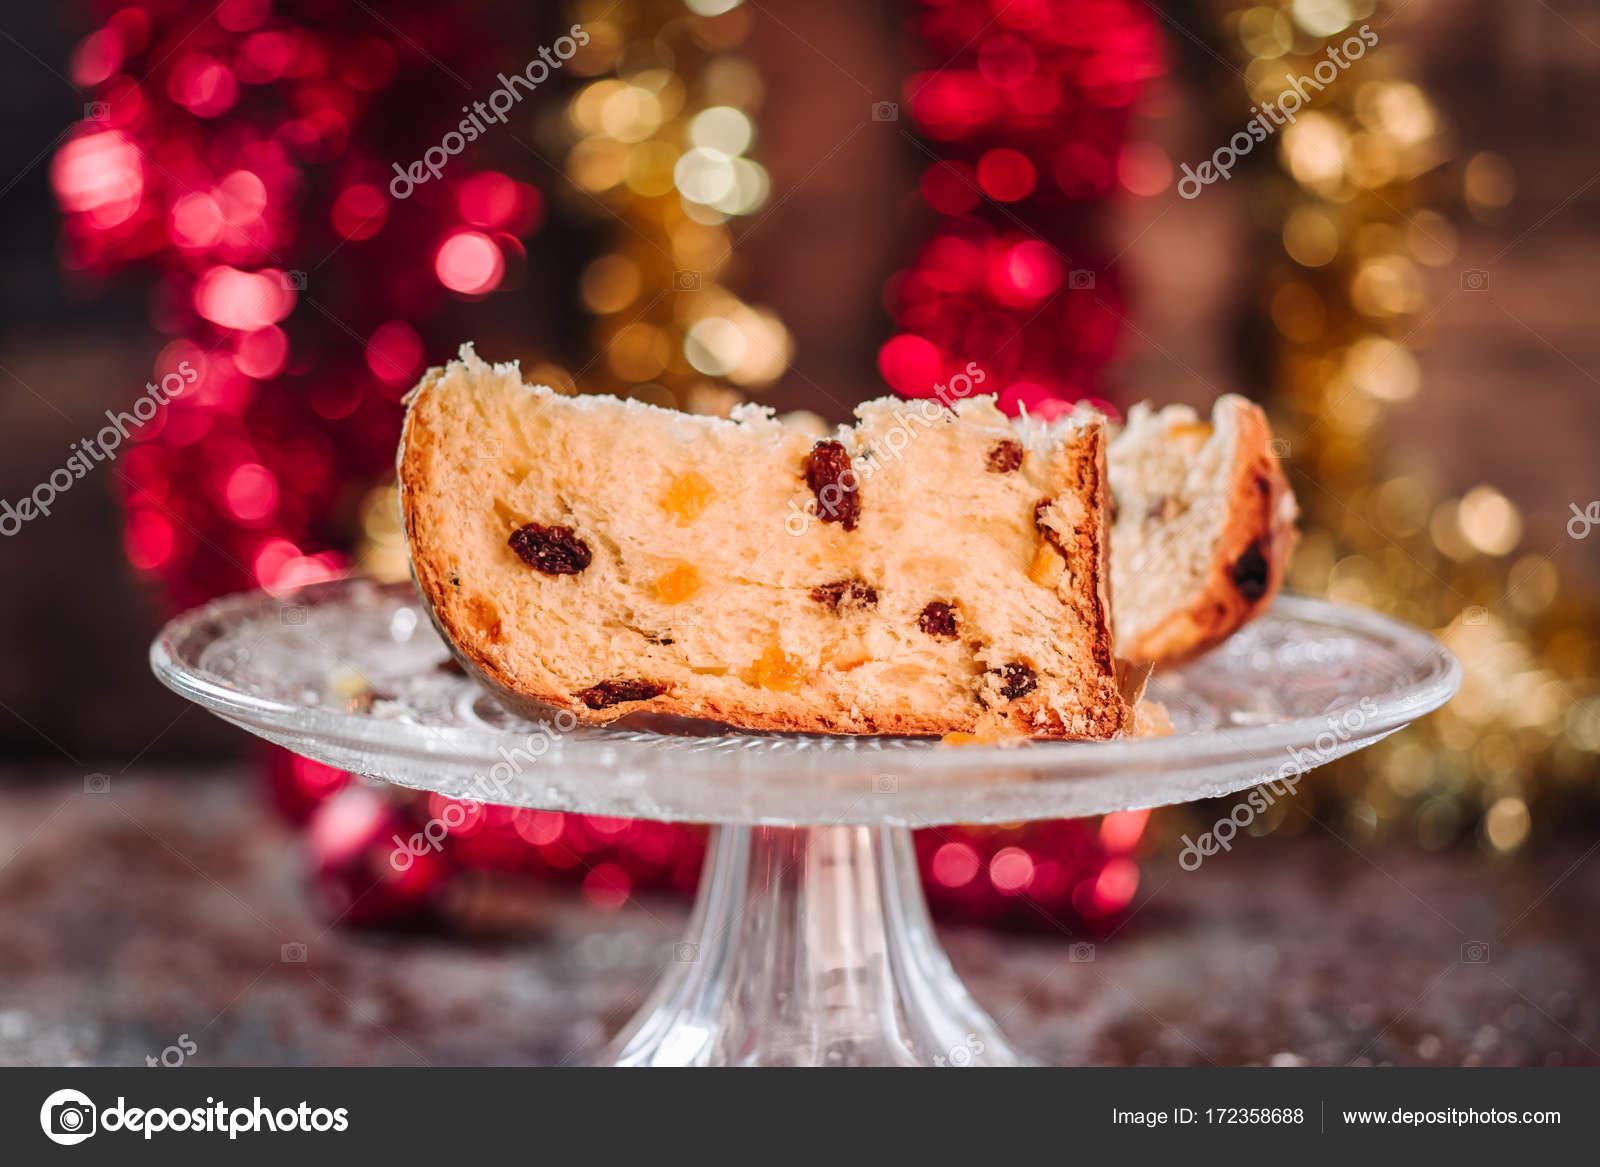 Chocolate Panettone Cake